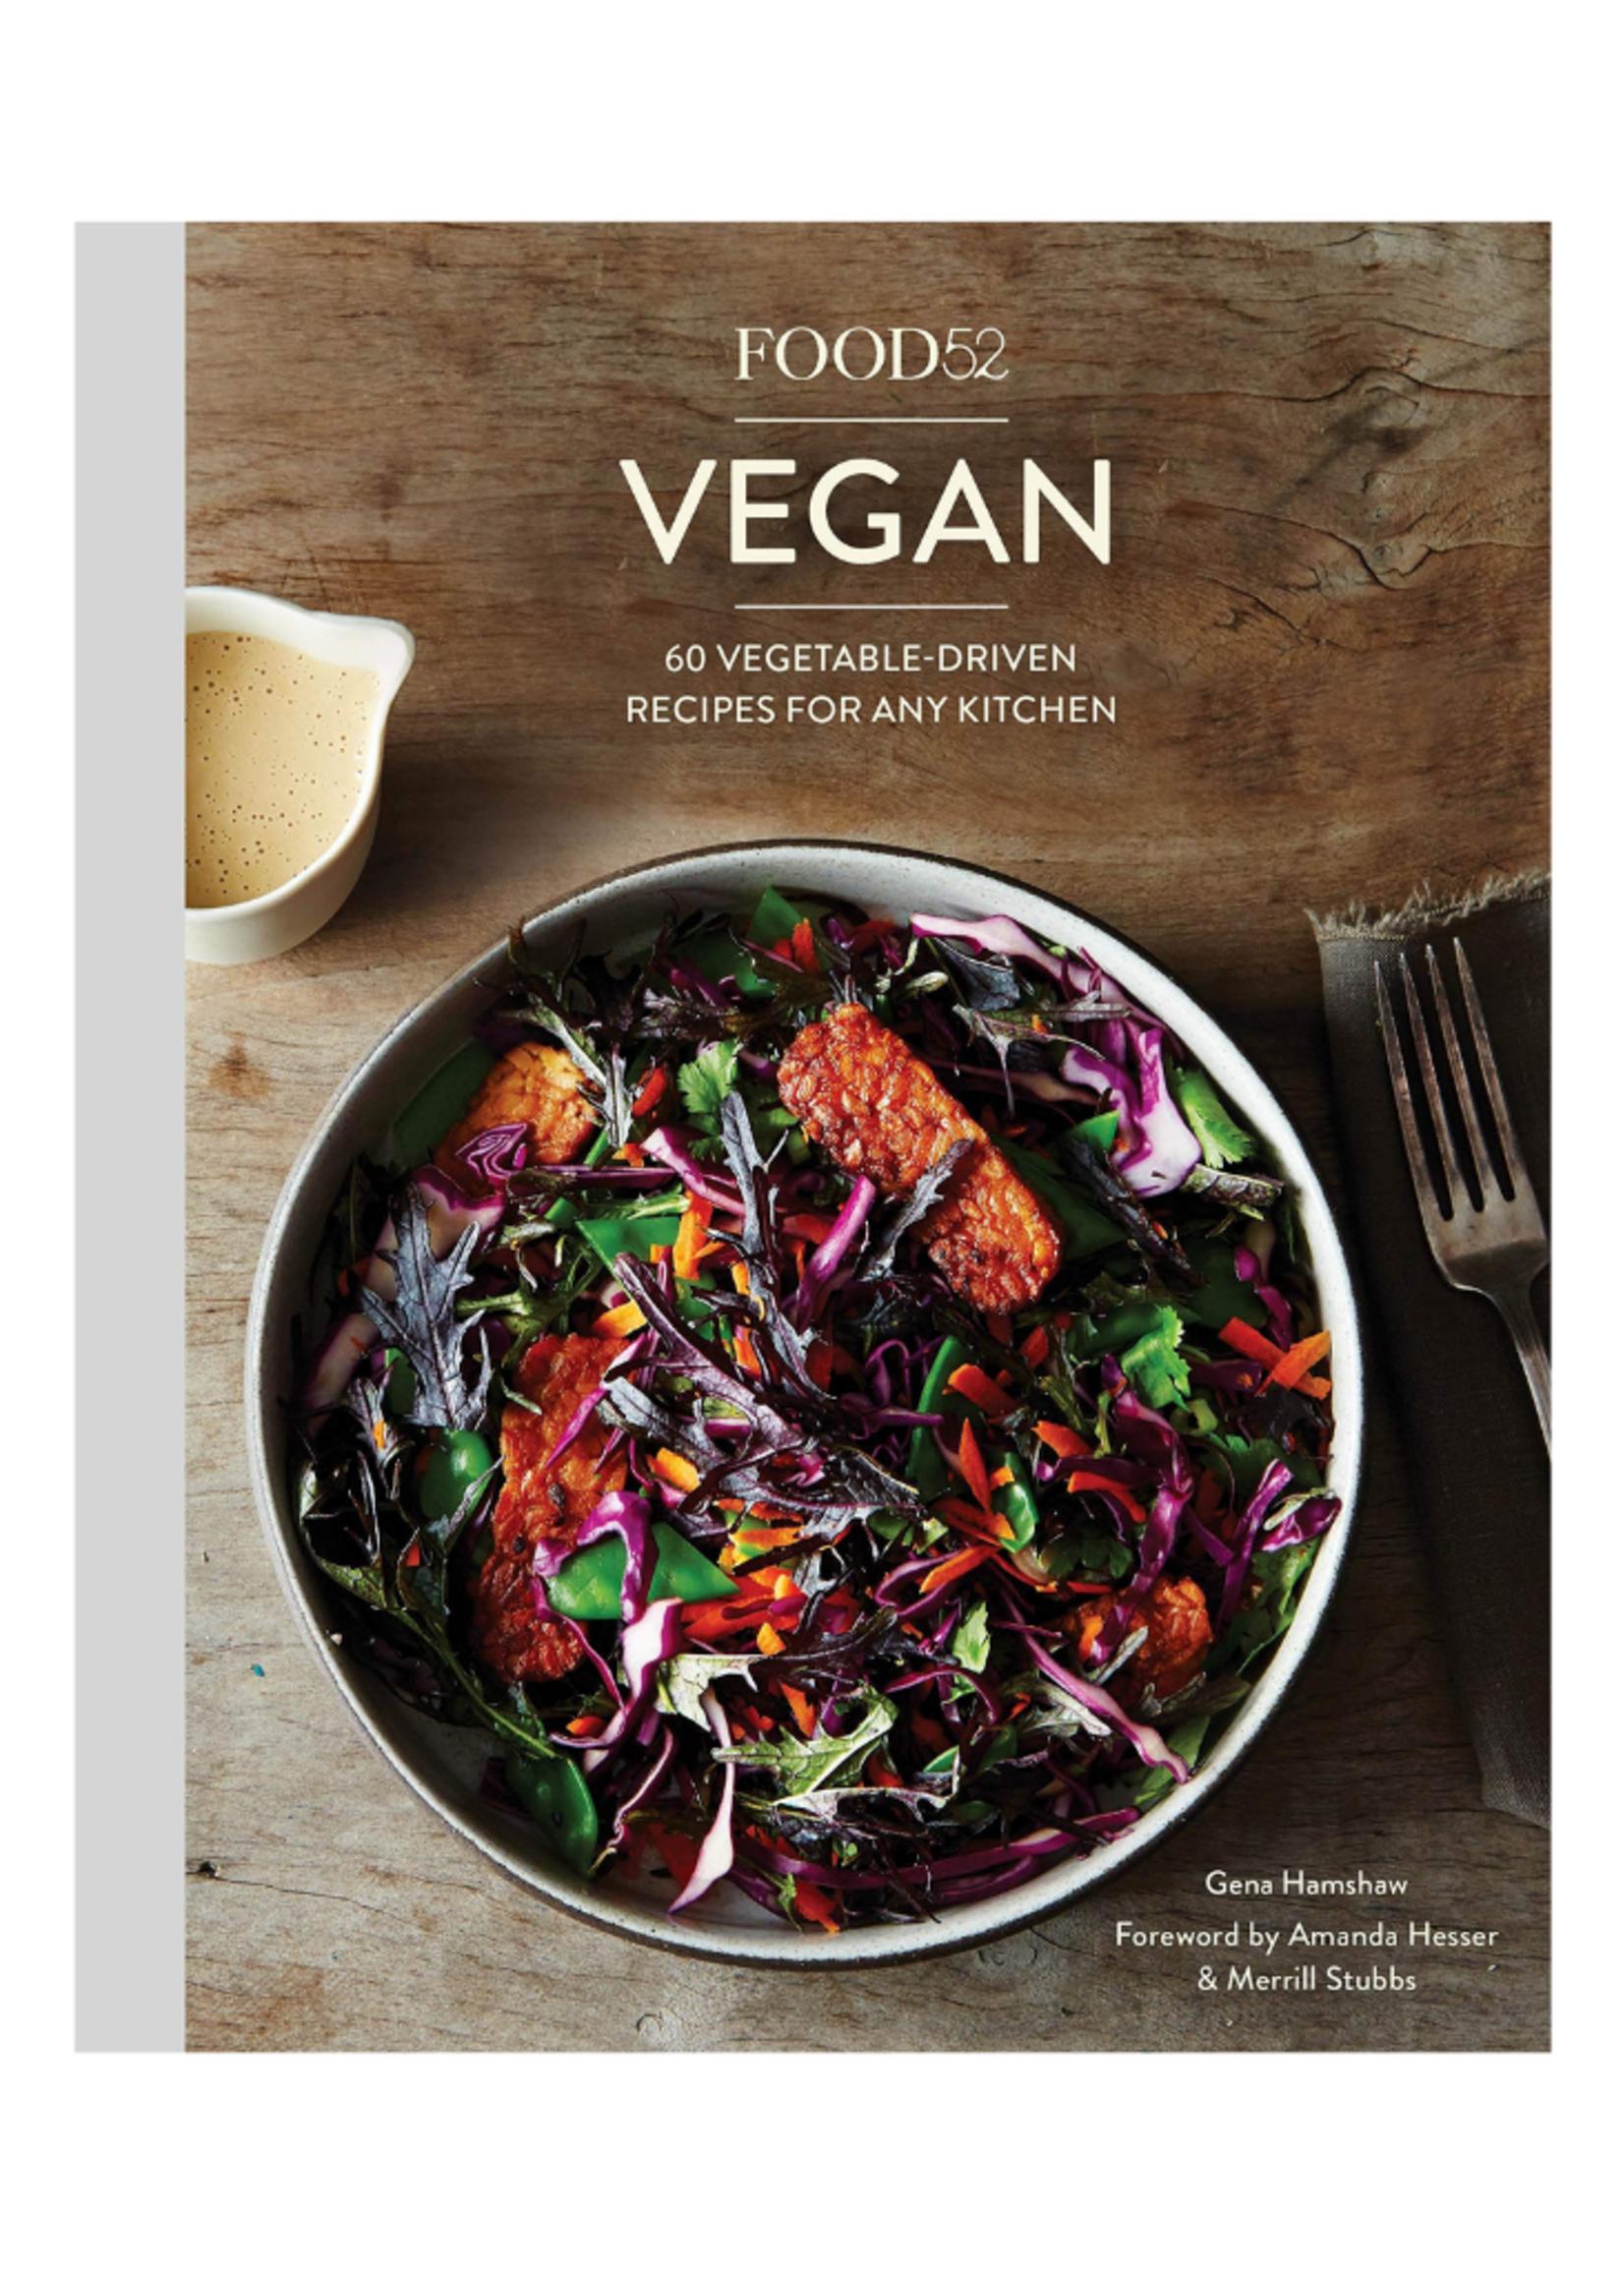 Random House Food52 Vegan by Gena Hamshaw